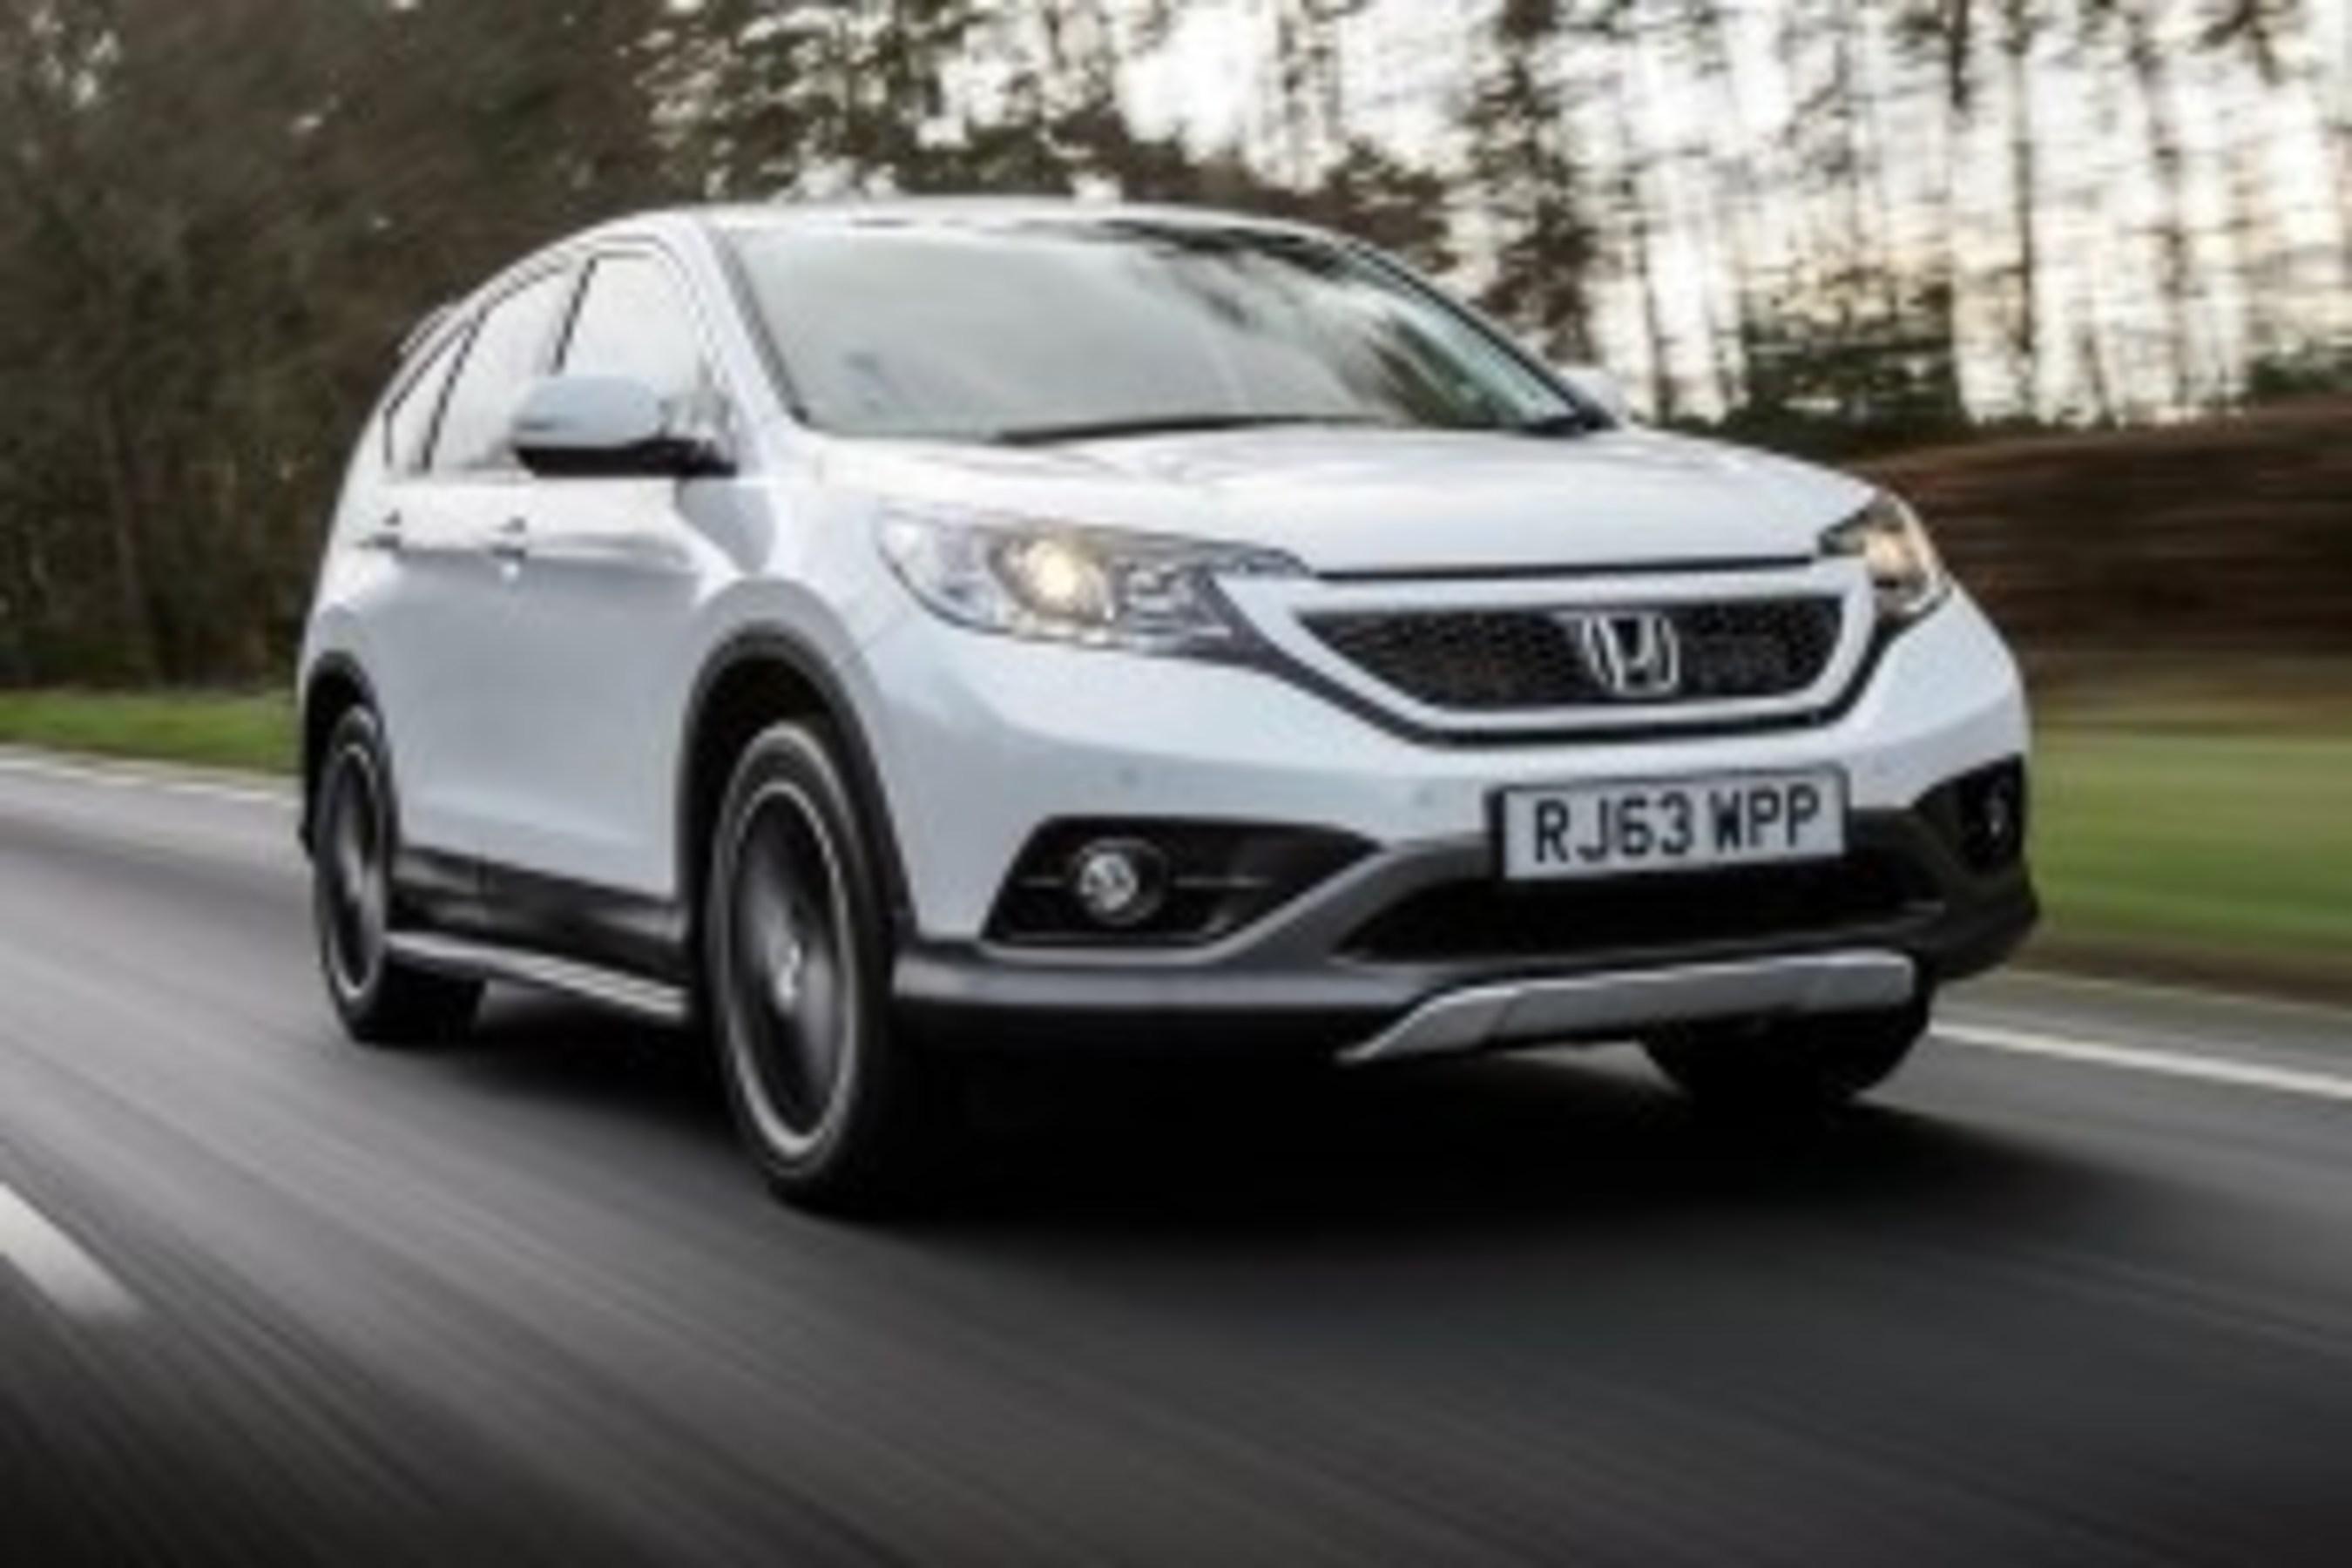 Honda Recalls 2016 CR-V Cars Due To Takata Airbag Exploding Risk